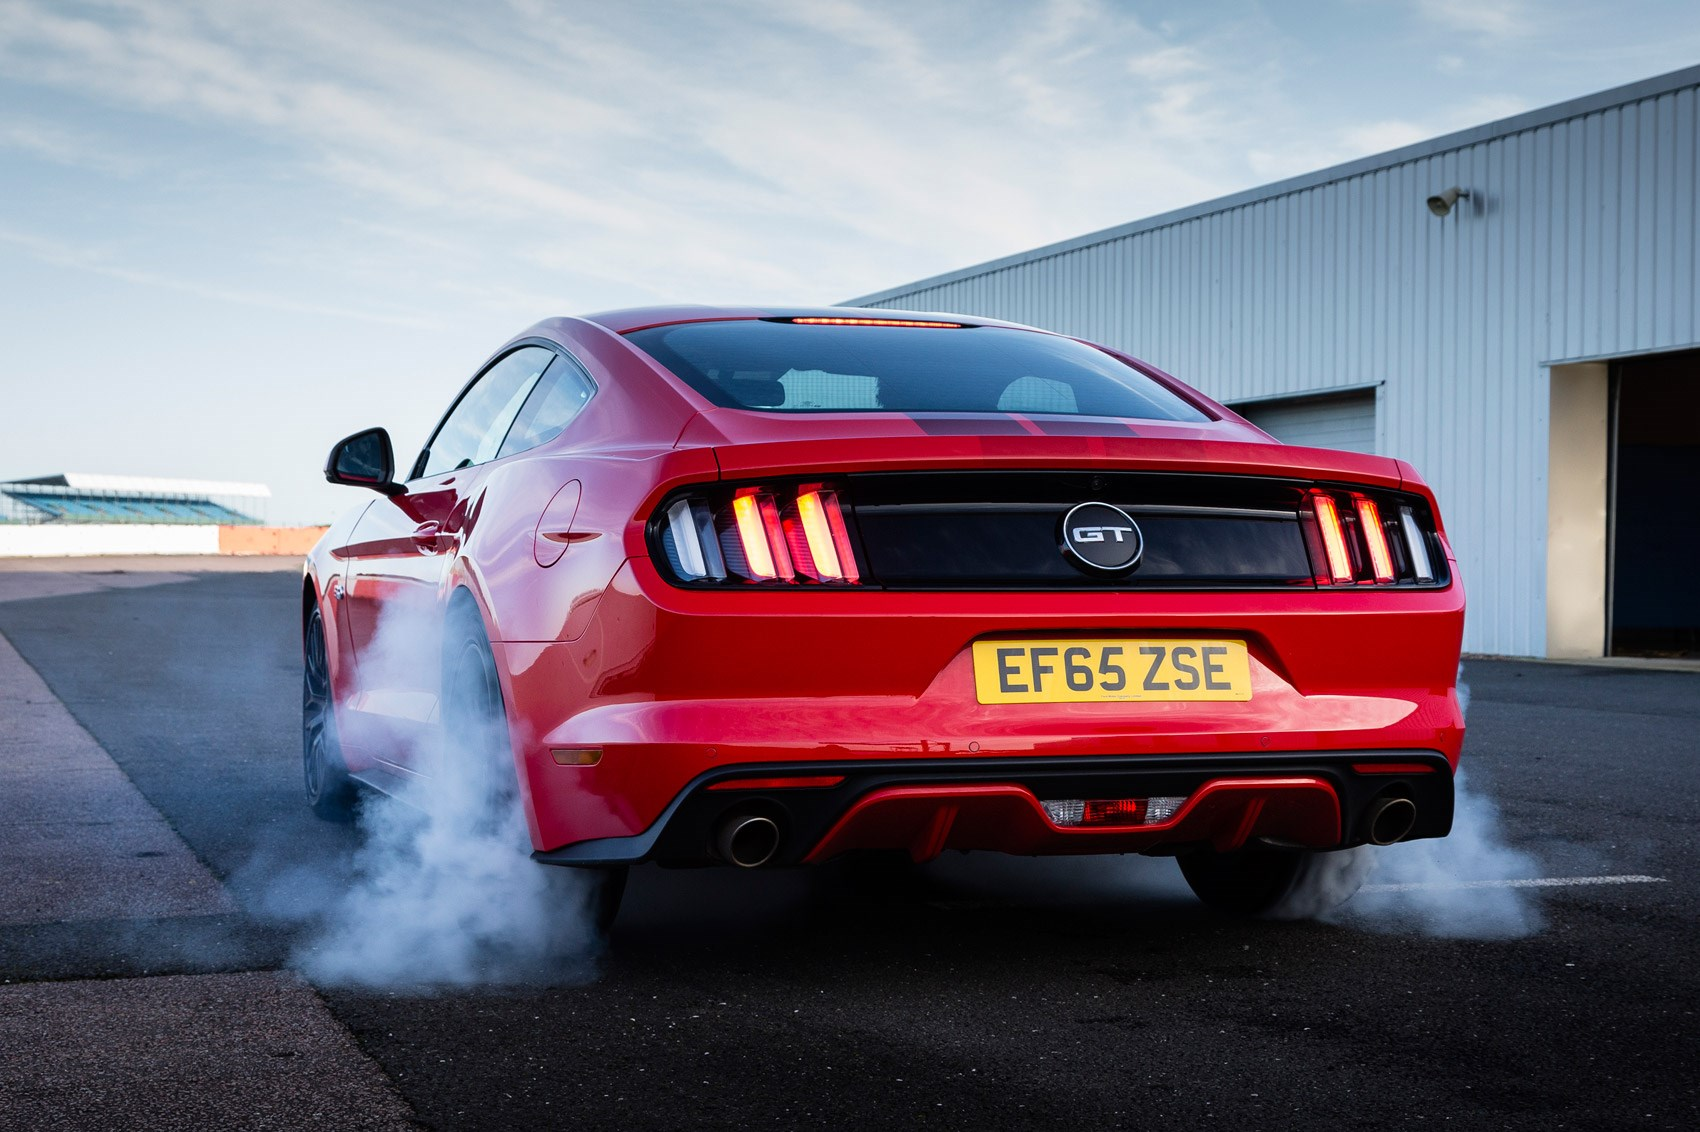 Mustang Brake Control/Line Lock